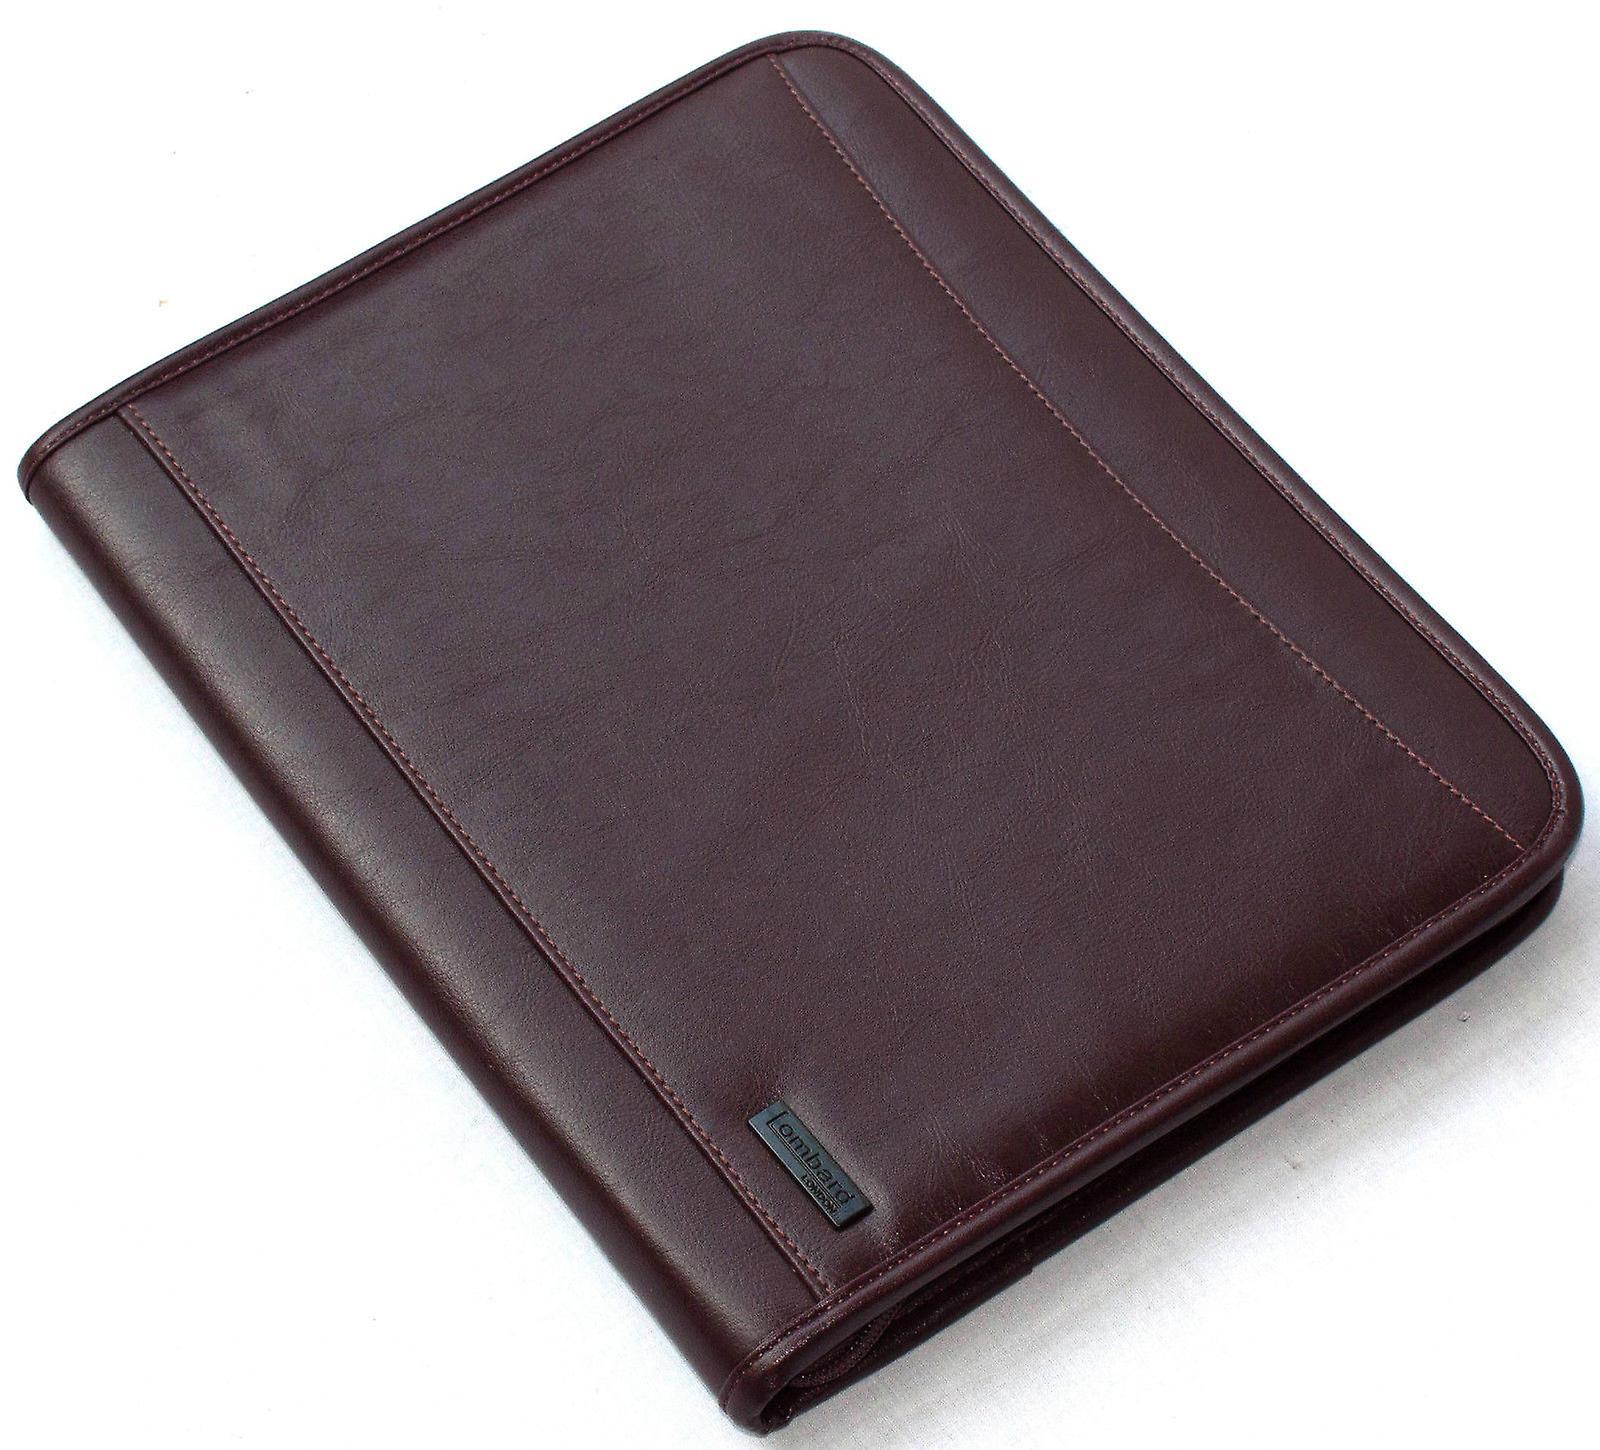 A4 Conference Folder Folio Case Pu Leather Ipad Tablet Holder Pad Organiser